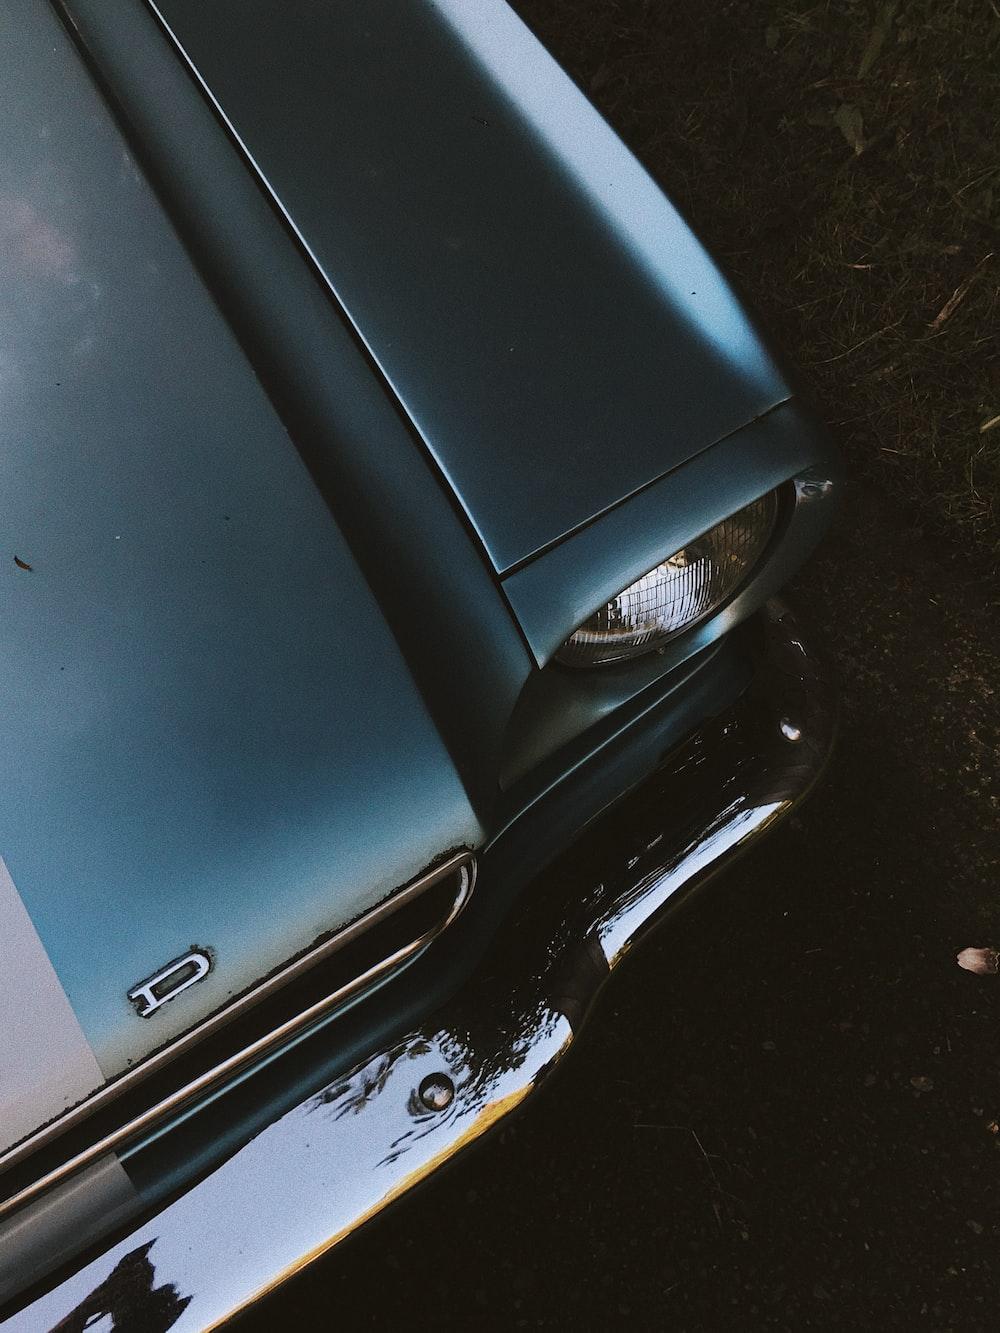 silver car on gray concrete floor